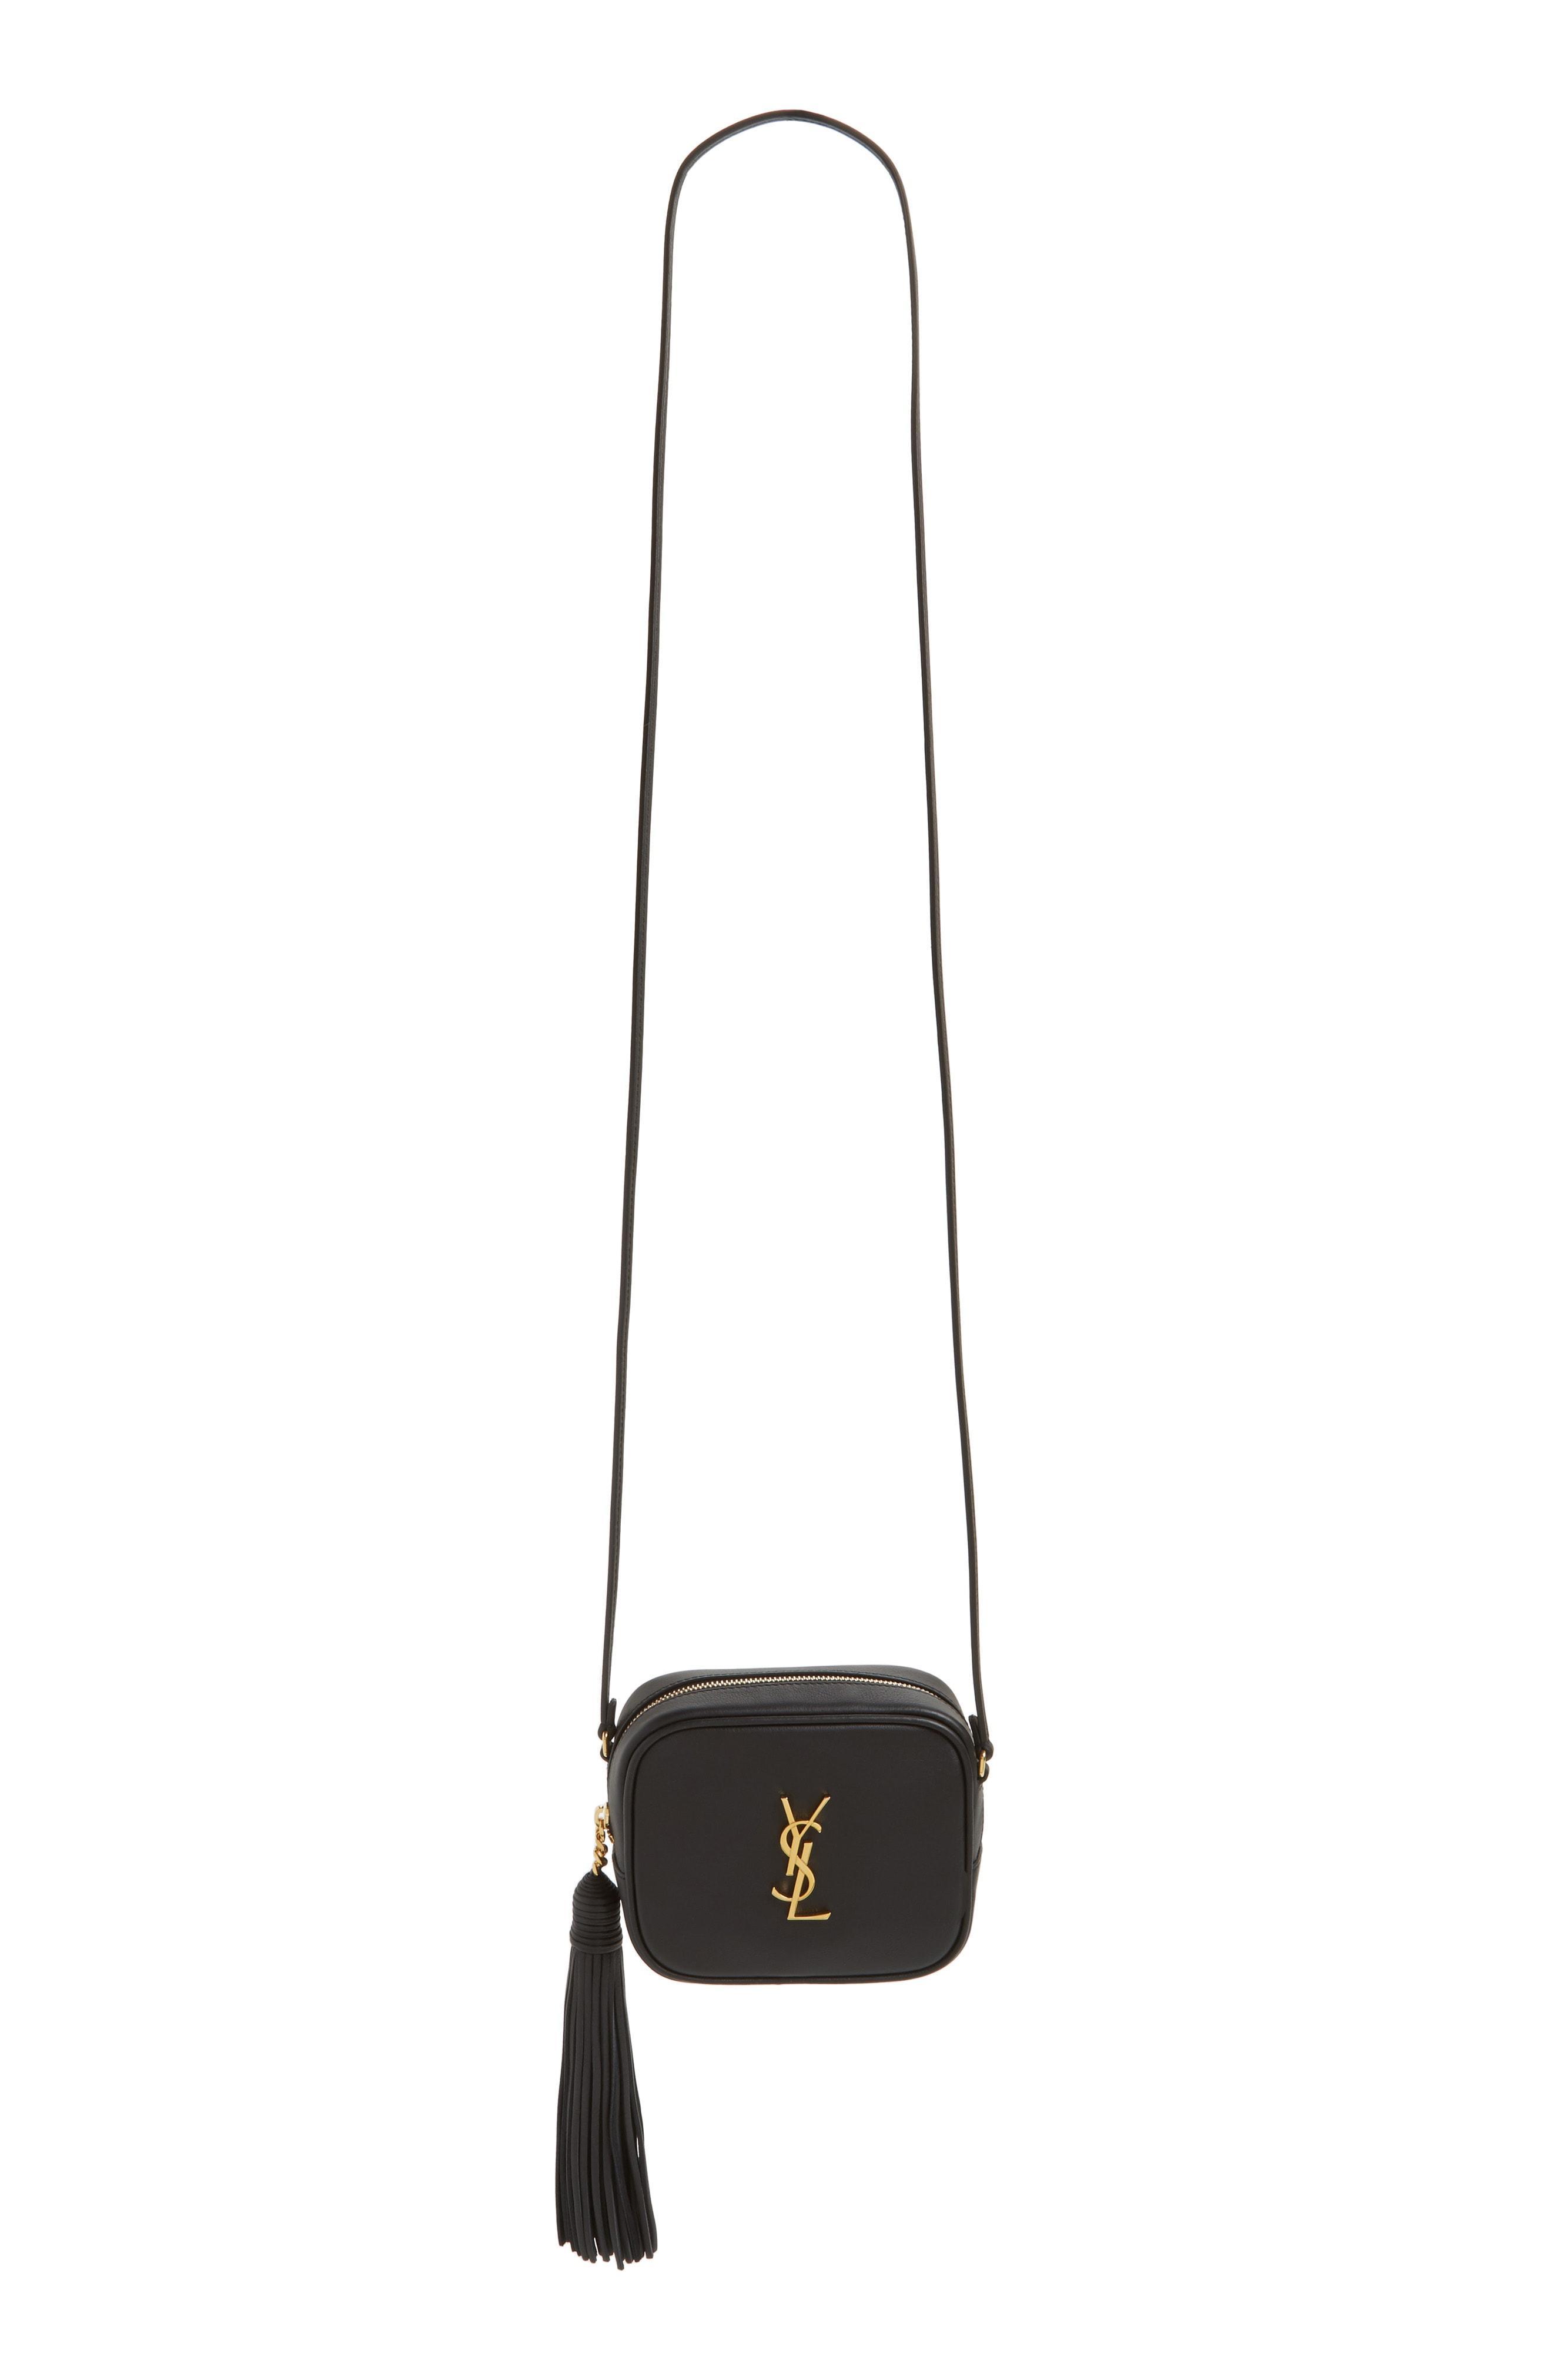 3c58a5ab20 Saint Laurent. Women s Black Monogram Blogger Leather Cross-Body Bag